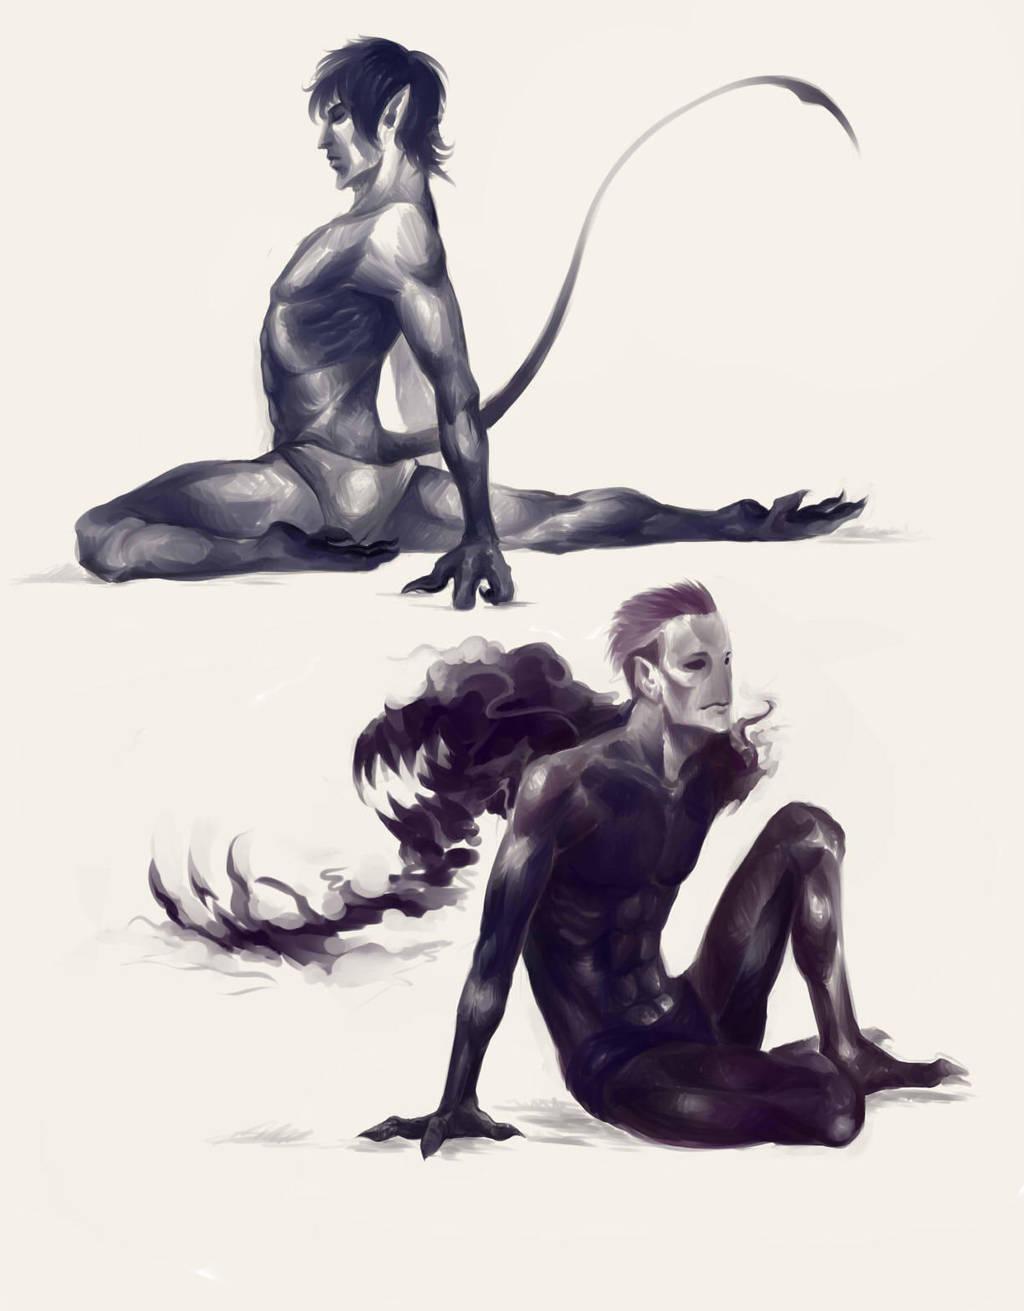 Nightcrawler and Abyss by ananovik